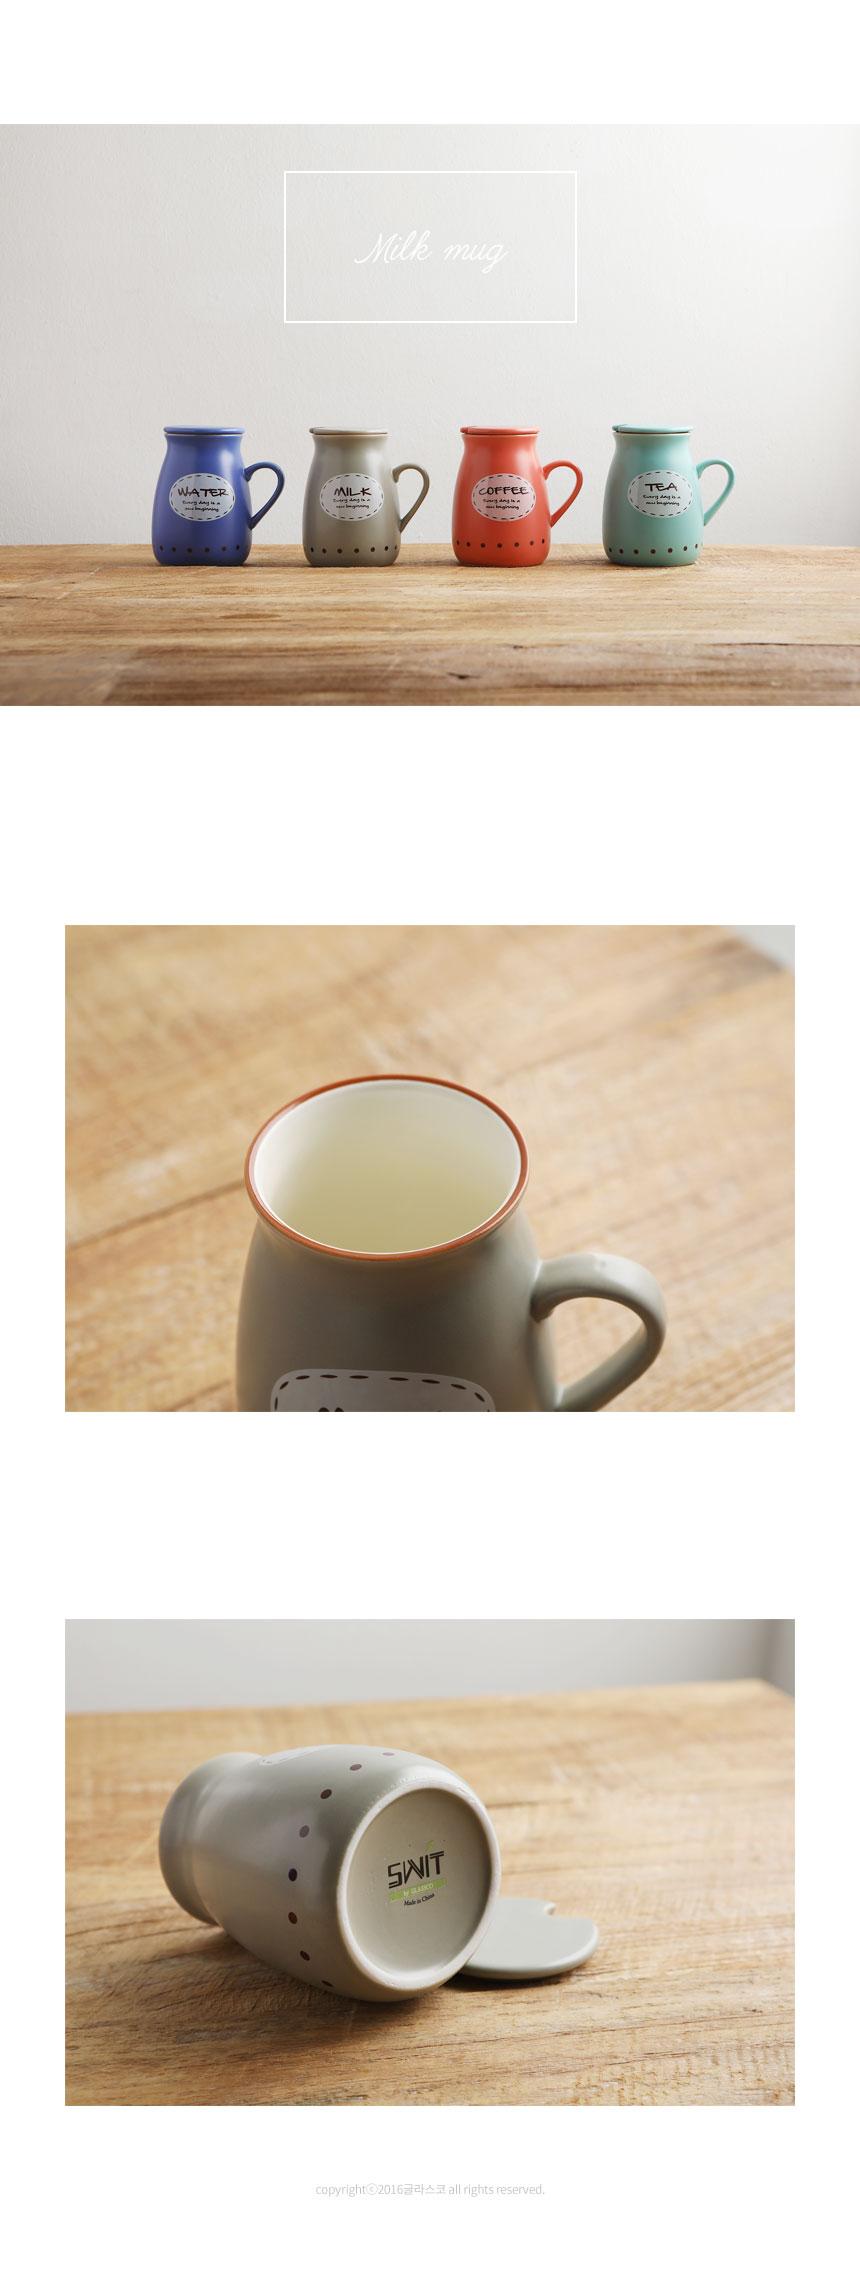 [SALE]사무실 뚜껑 밀크 머그잔컵 - 글라스코, 3,500원, 머그컵, 심플머그